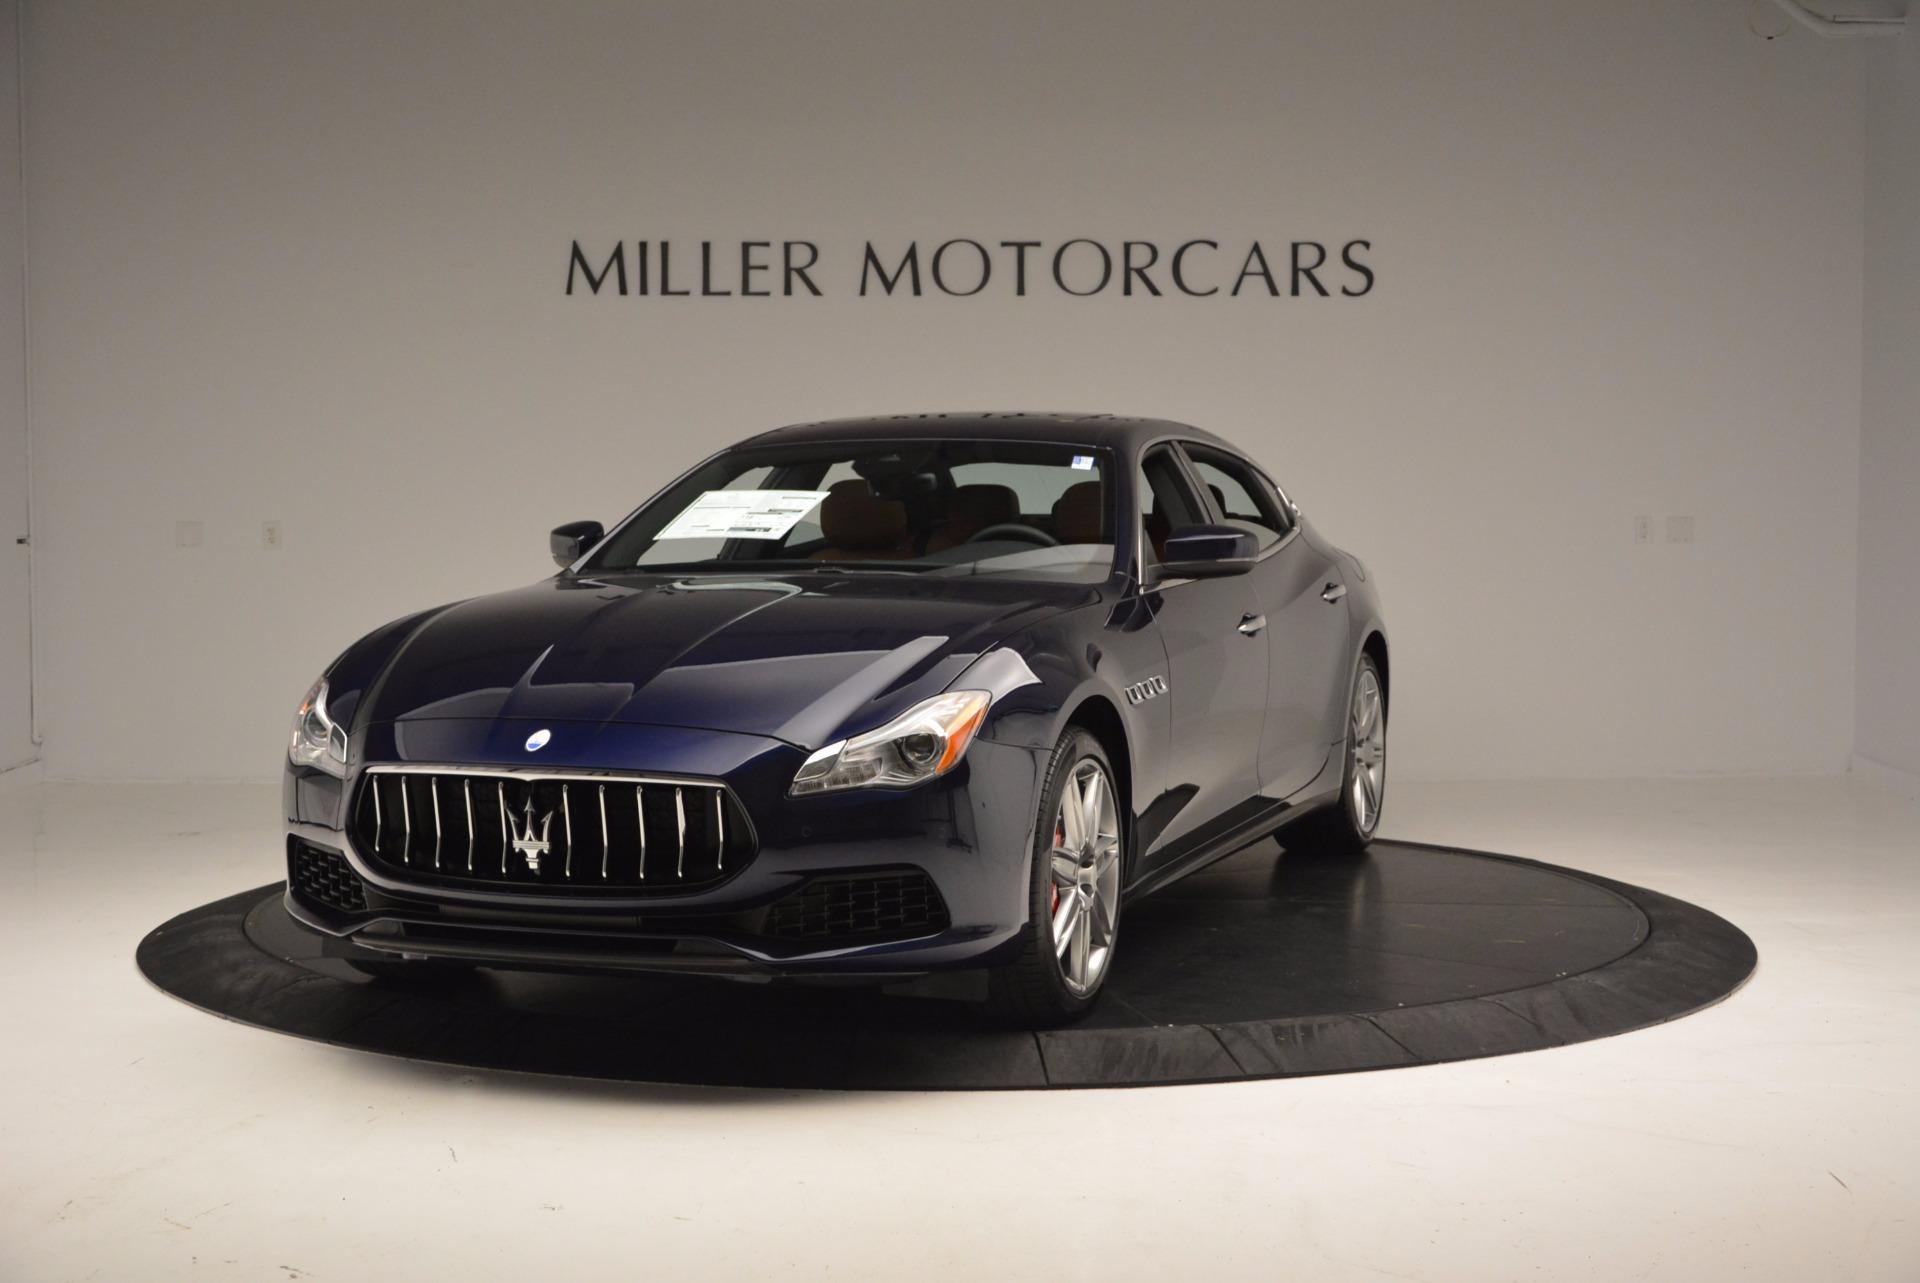 New 2017 Maserati Quattroporte S Q4 for sale Sold at McLaren Greenwich in Greenwich CT 06830 1